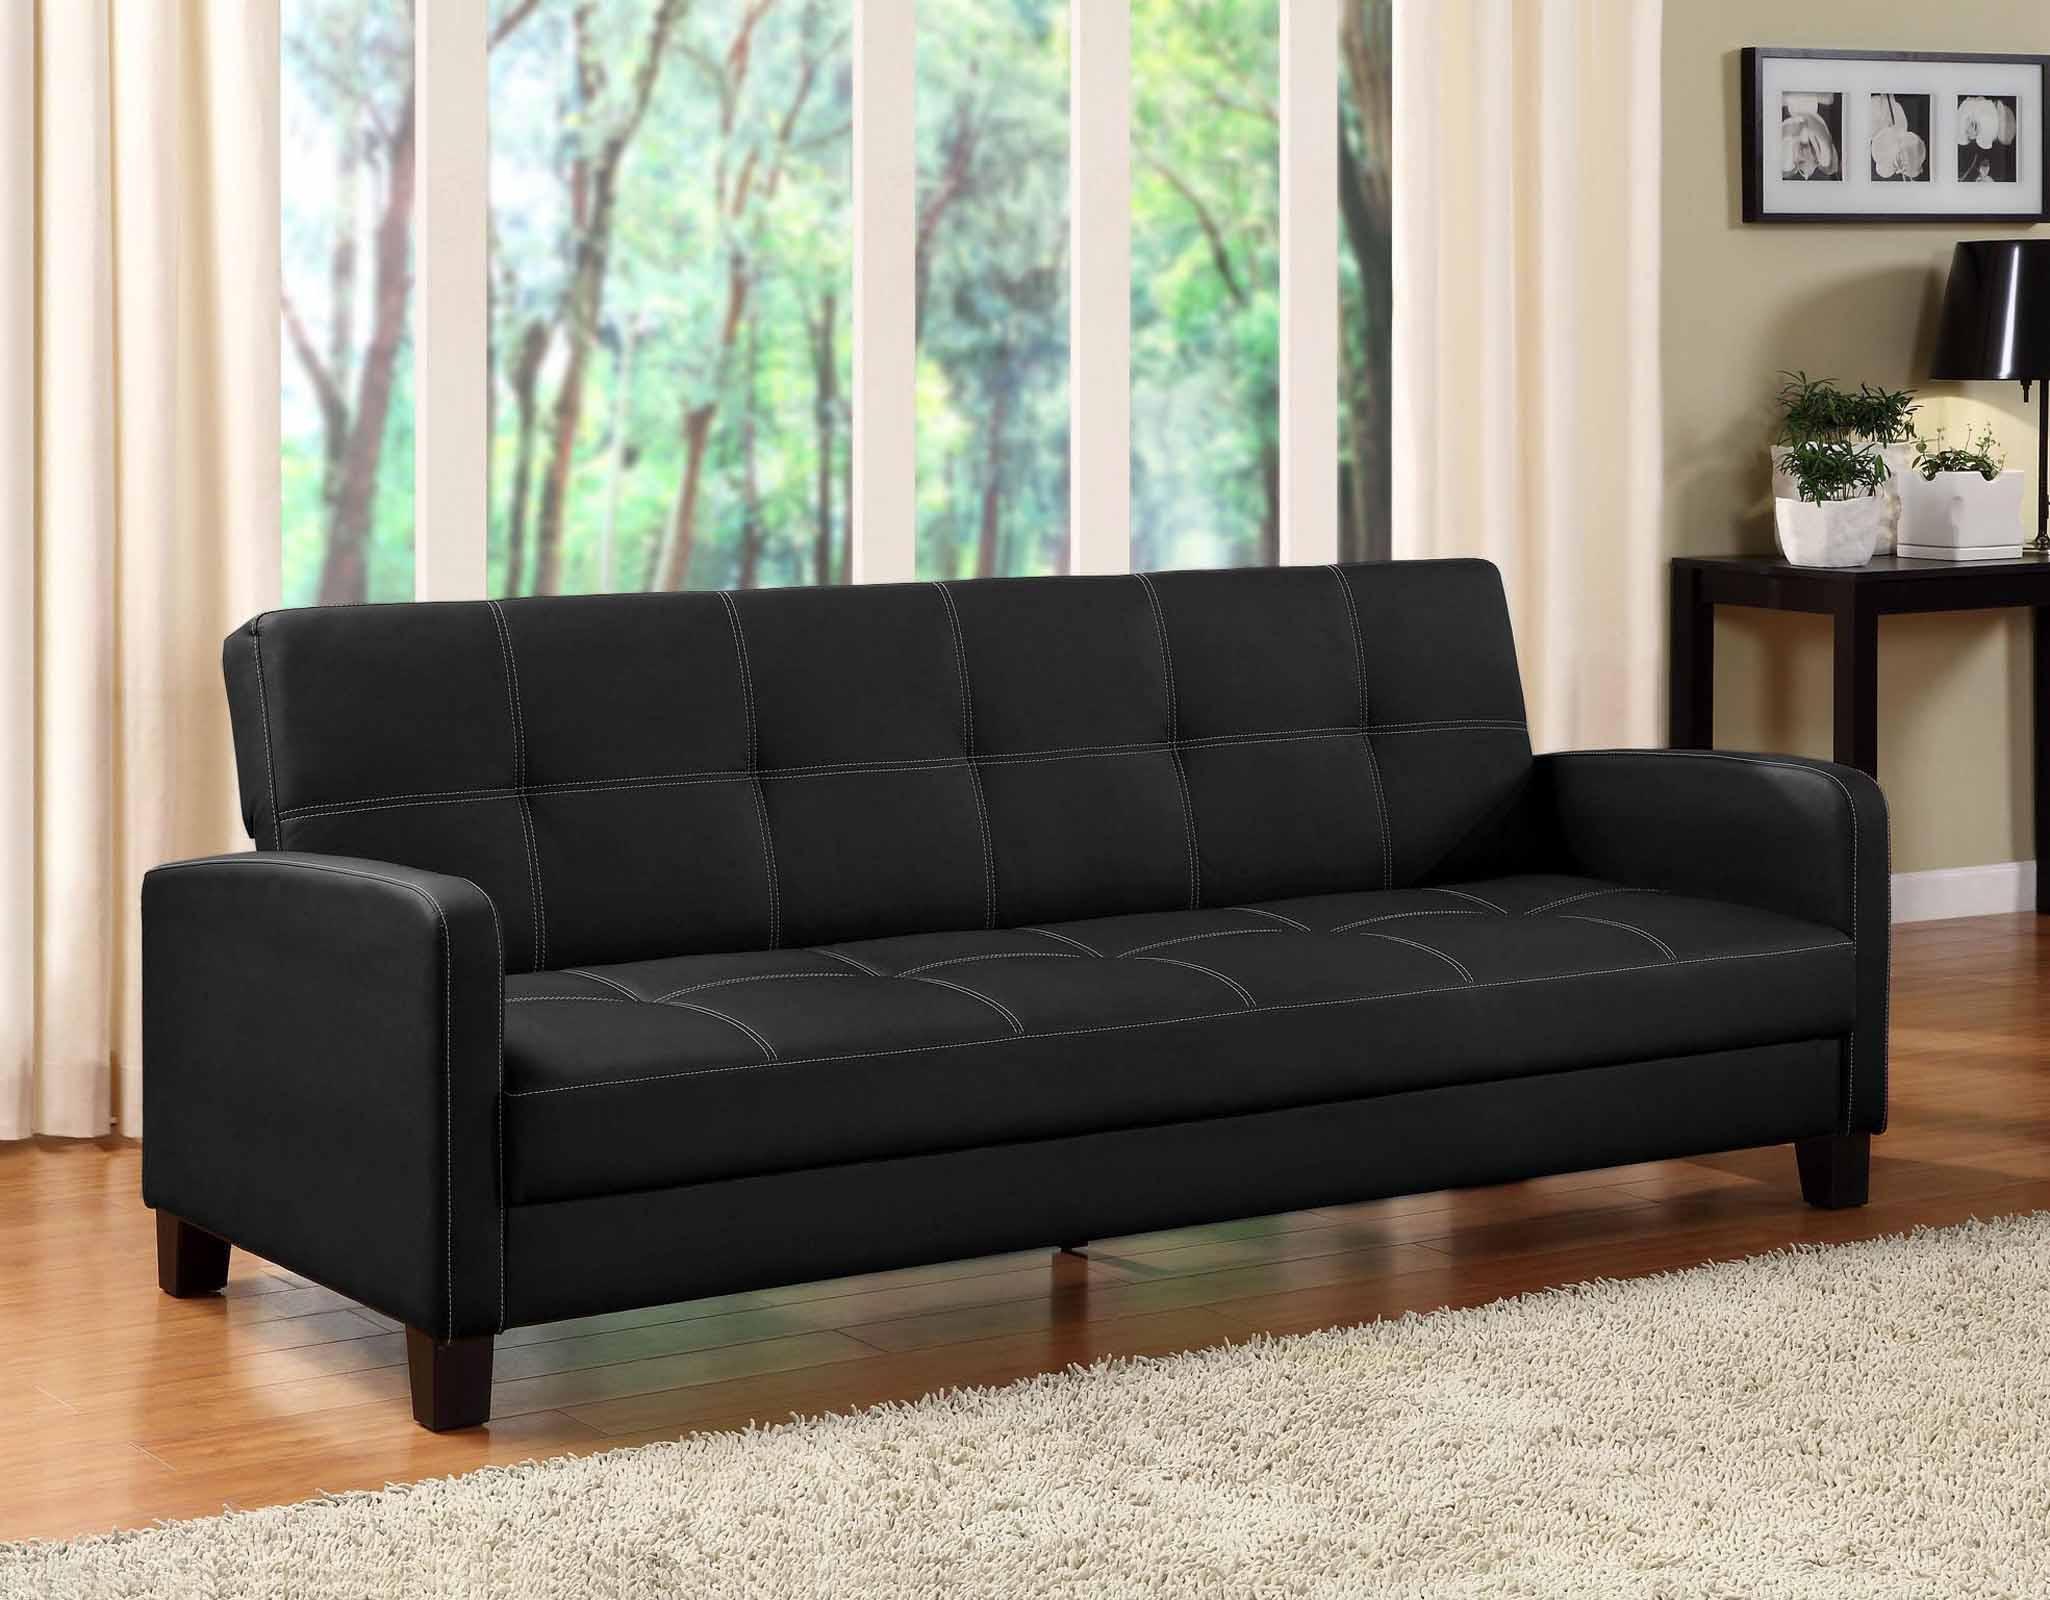 ■sofa bed Fondle Kmart Sofa Bed Futon Critic Futons Walmart